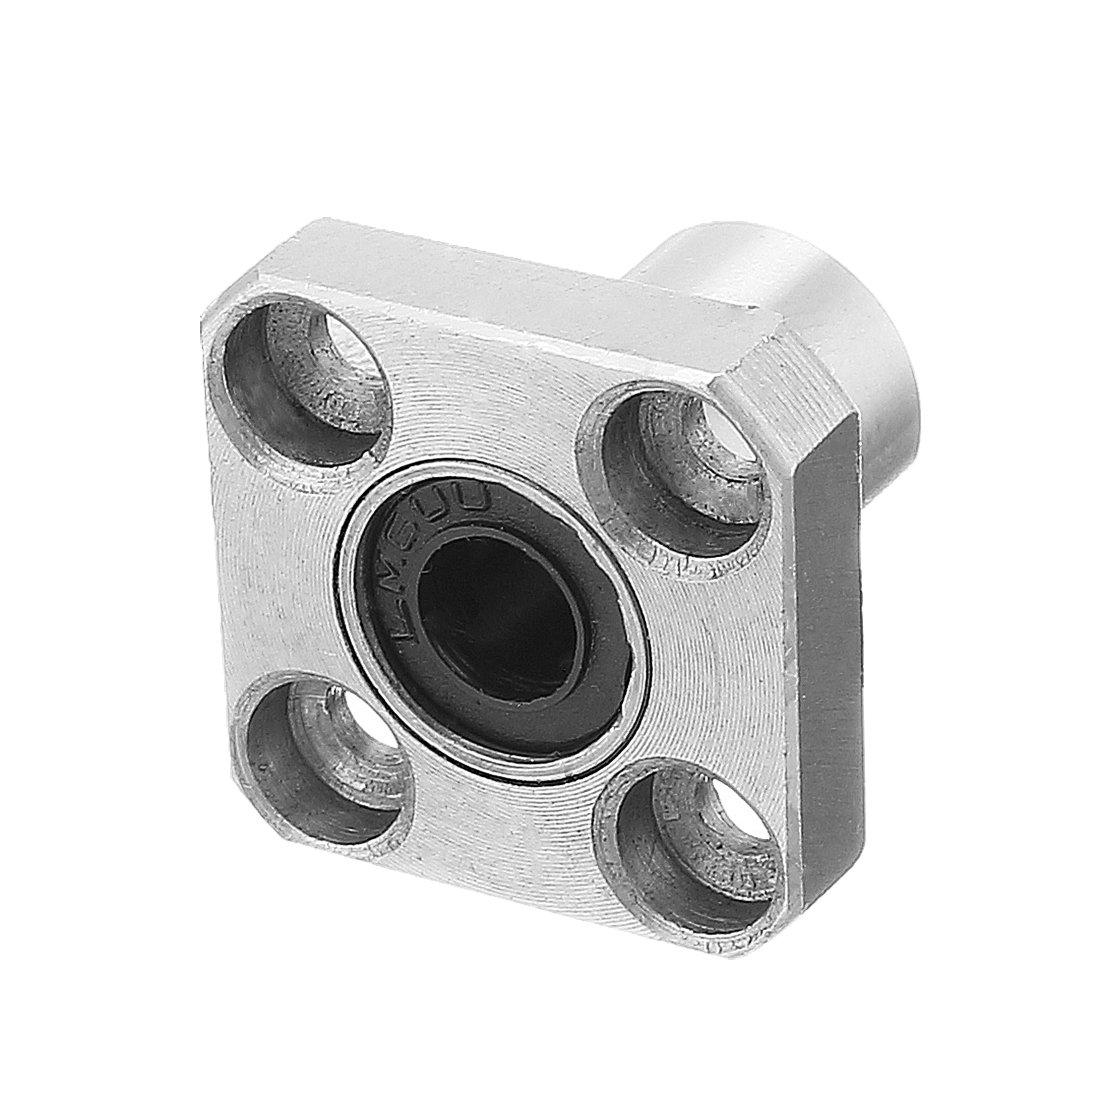 uxcell LMK16UU 16mmx28mmx37mm Flange Linear Motion Bushing Ball Bearing 2 Pcs